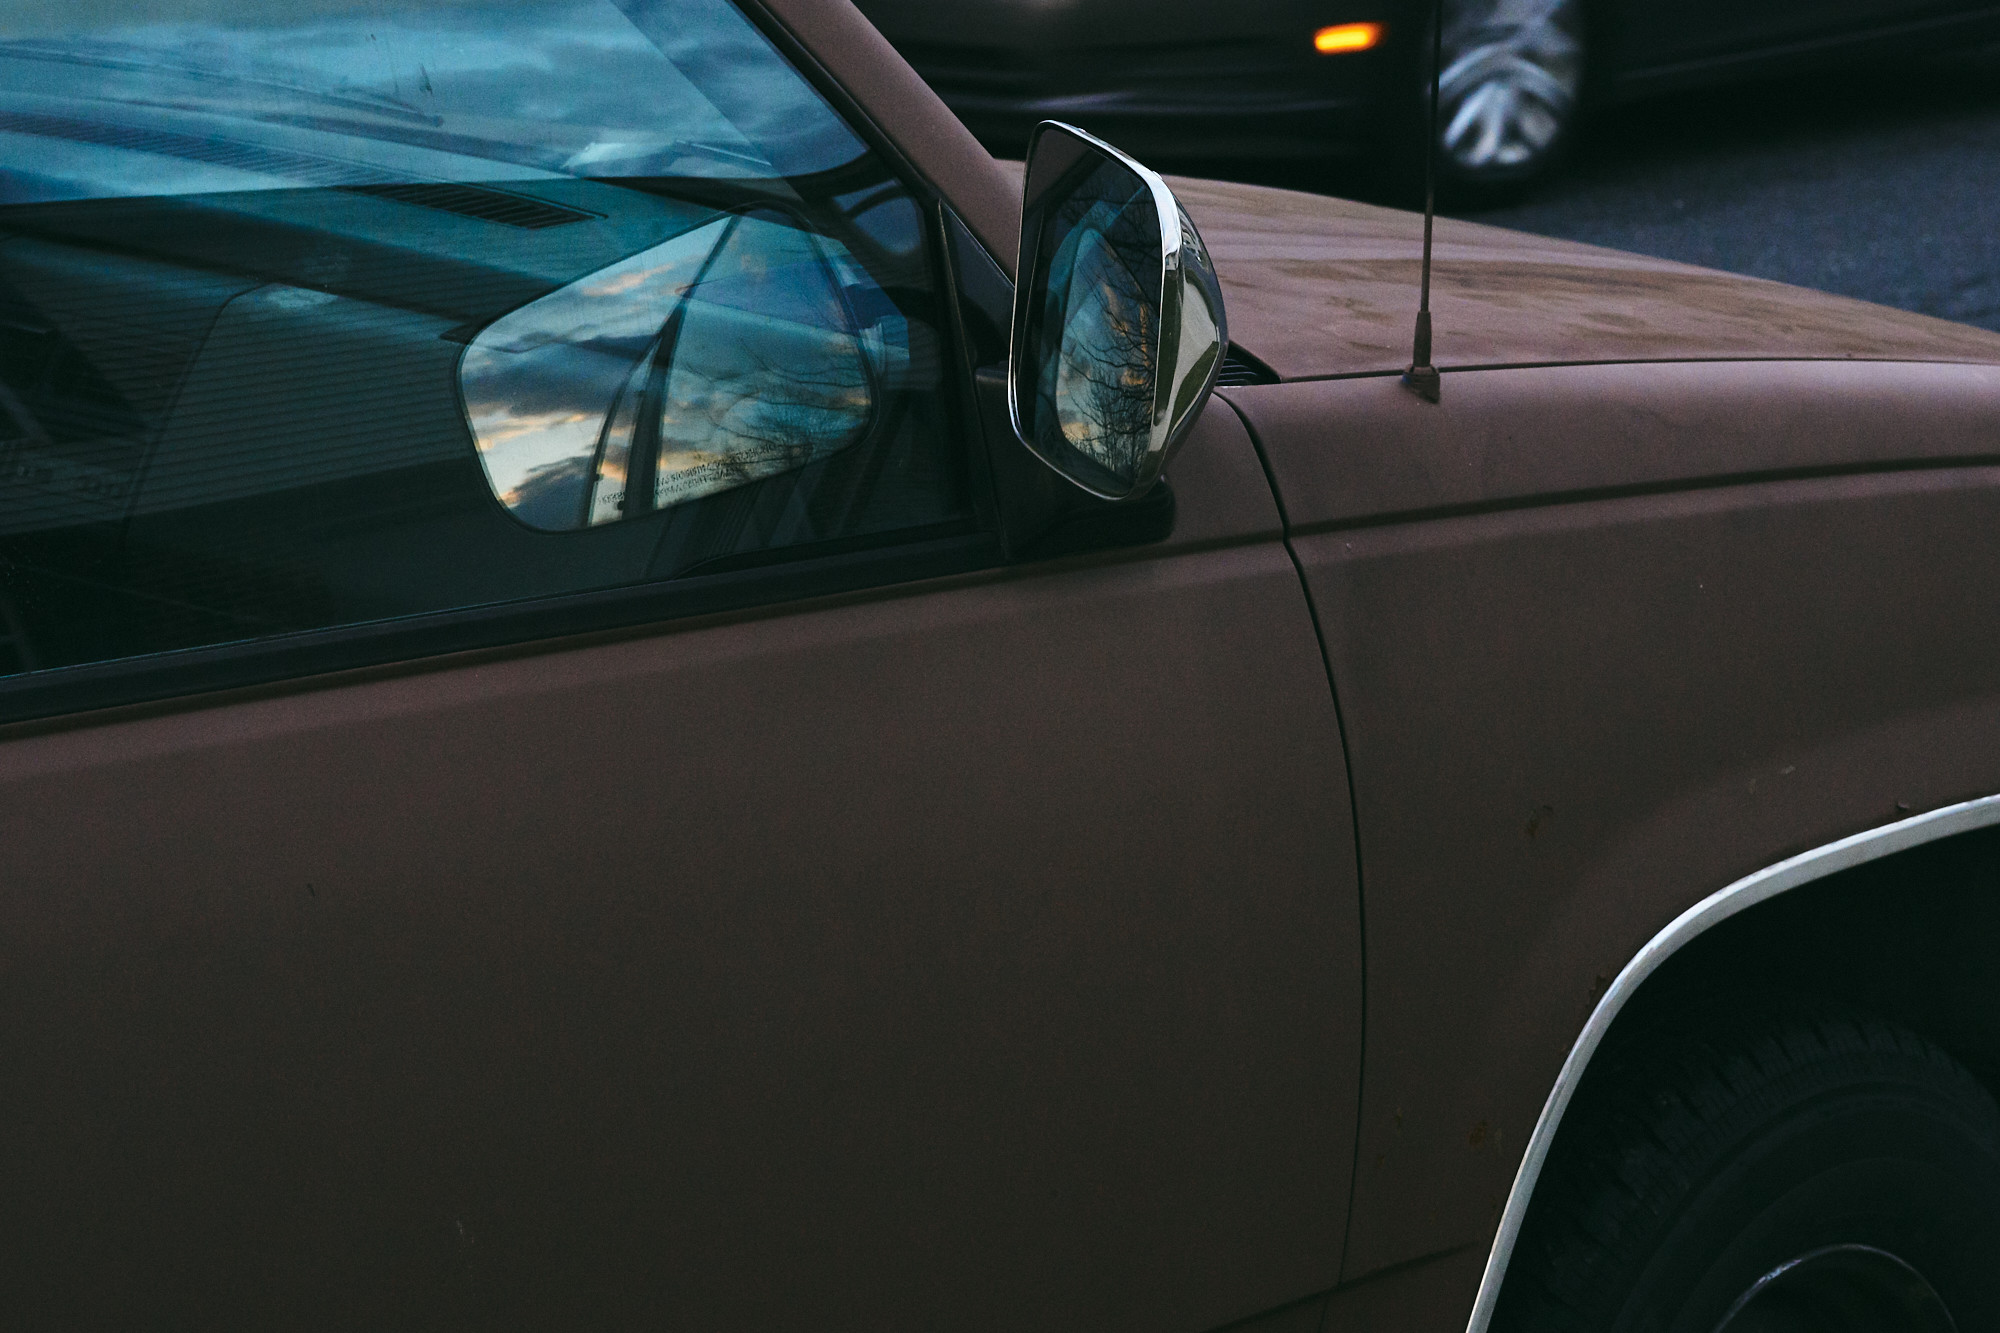 Truck, antique, classic car, street photography, Enola, Pennsylvania, Harrisburg, Cumberland County